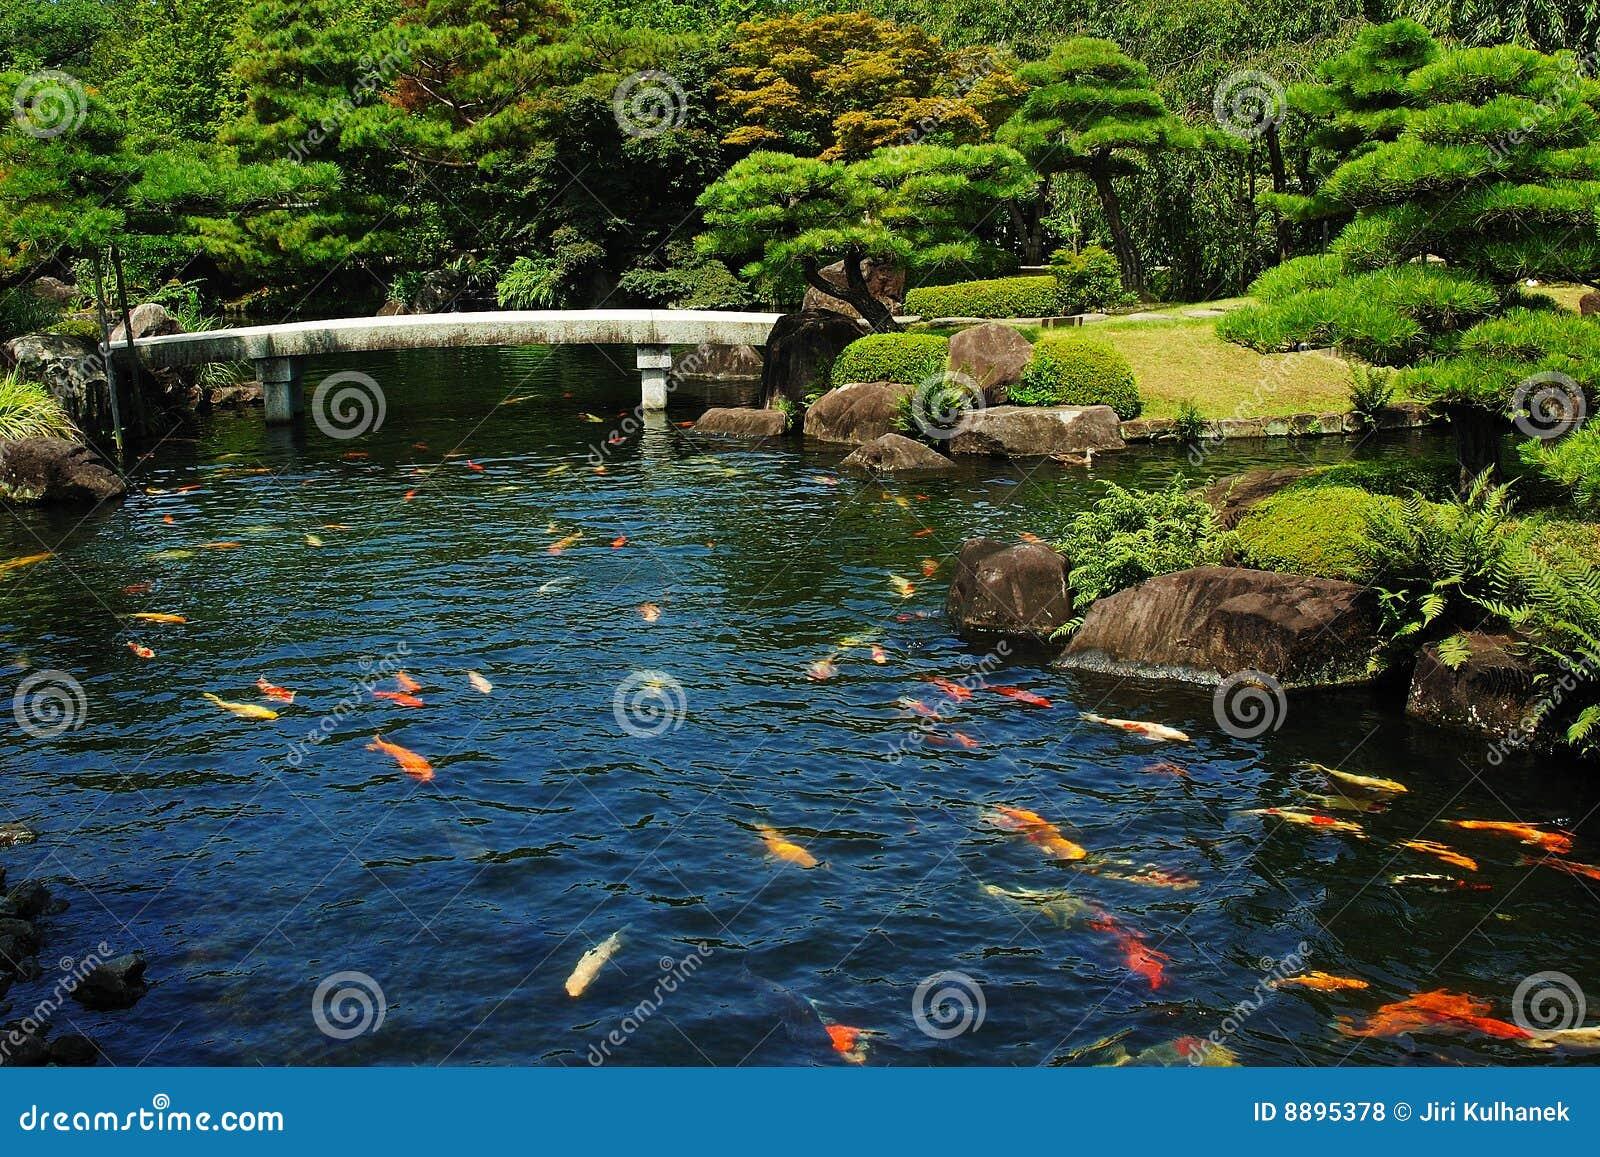 Fisch teich am japanischen garten lizenzfreie stockfotos for Teich garten